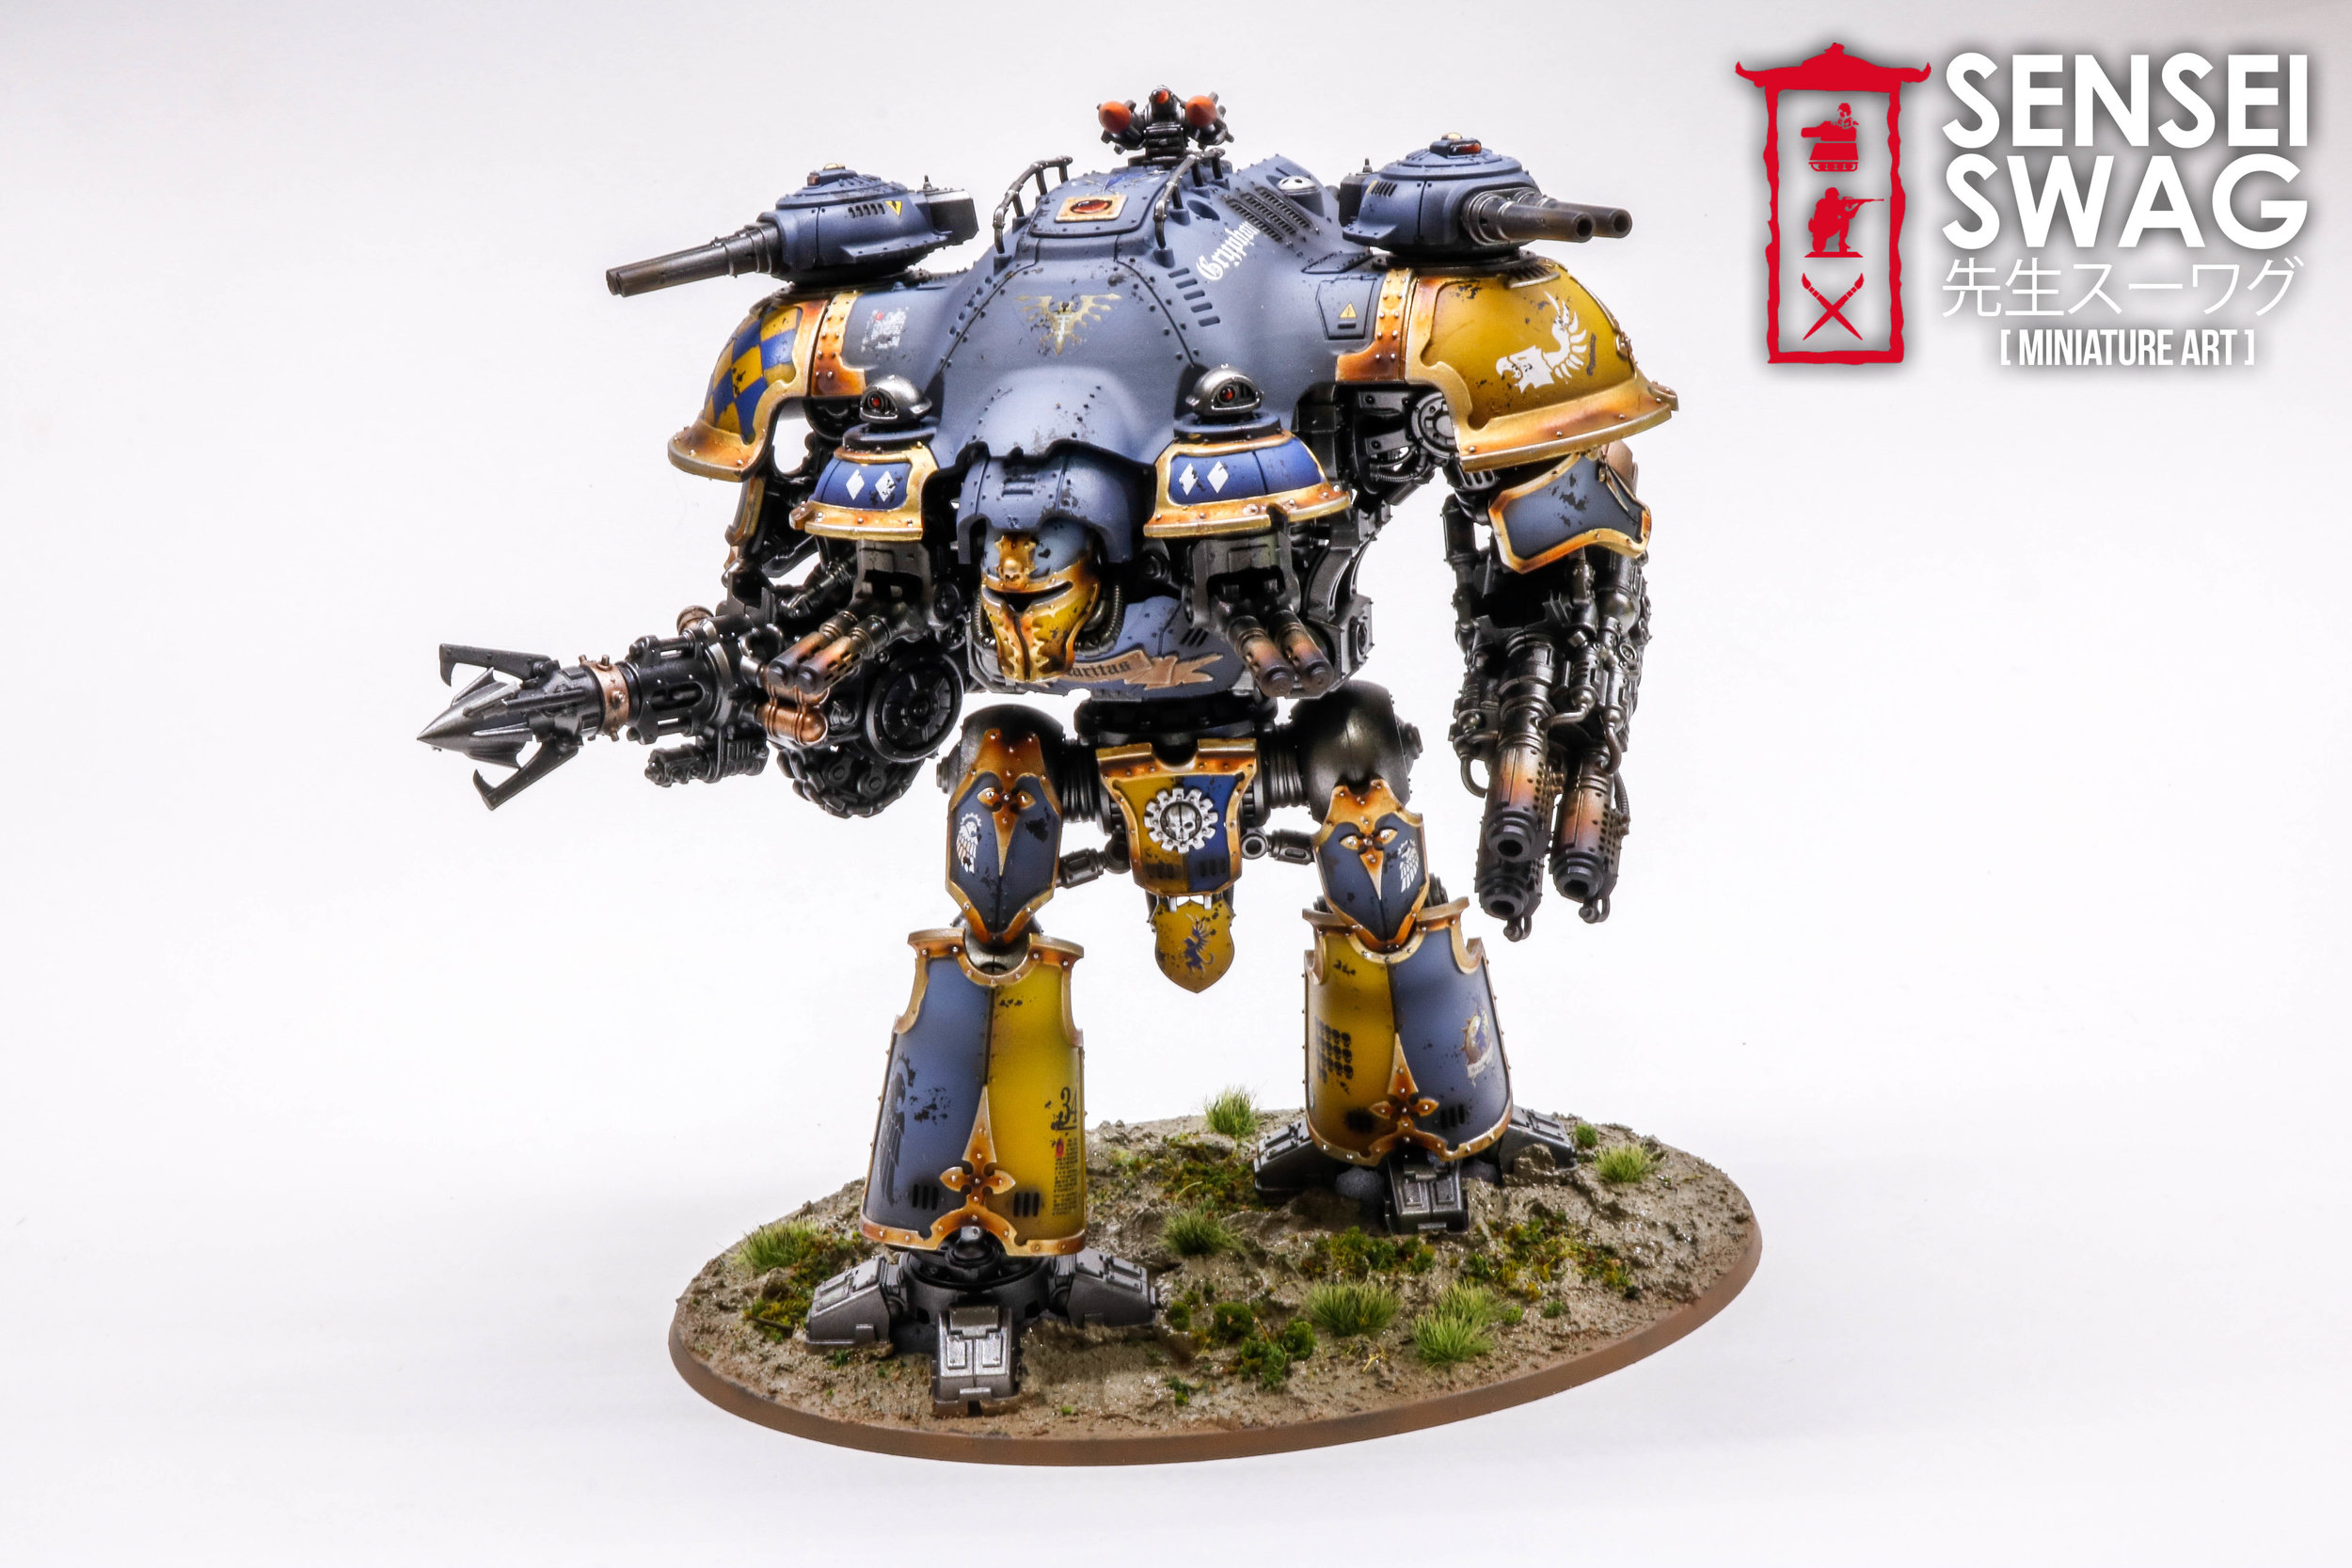 House Coldshroud Imperial Knight Valiant Legio Gryphonicus Armiger Warden Preceptor-2.jpg